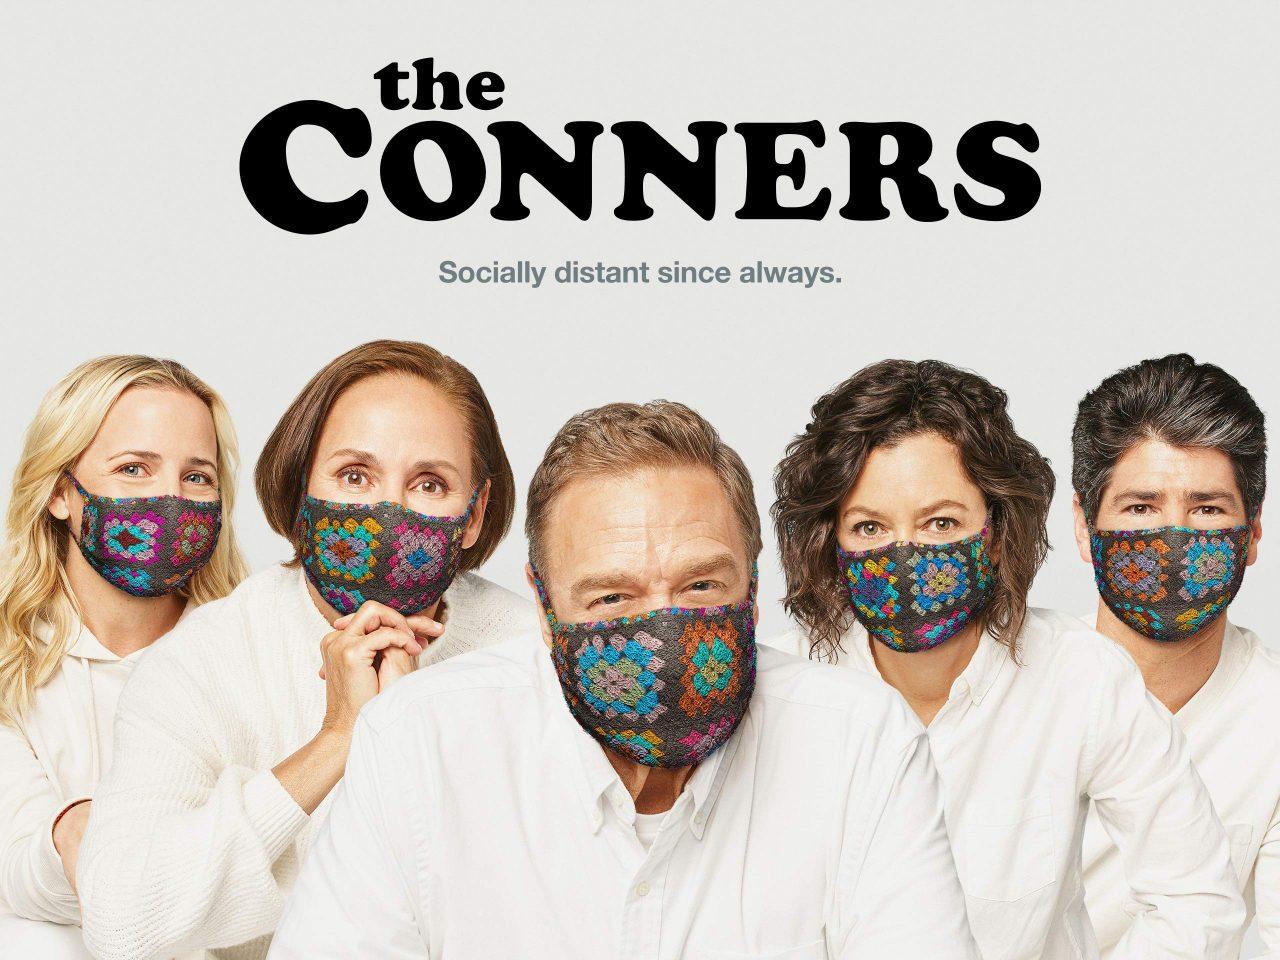 The Conners Season 3 Episode 11